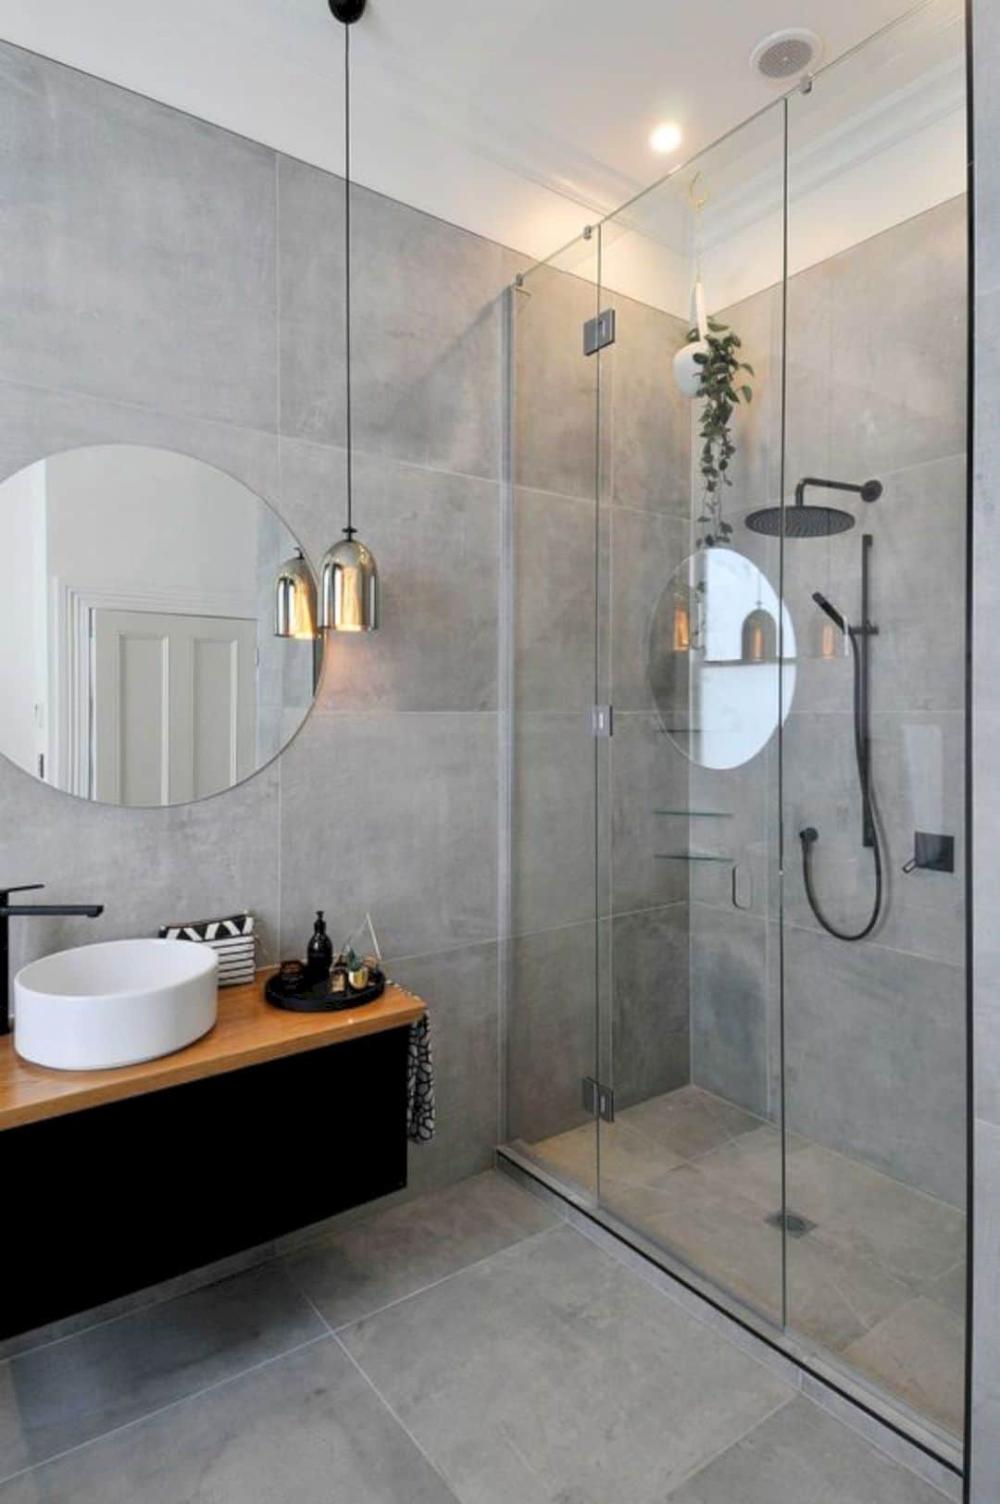 15 Ensuite Bathroom Ideas Bathroom Trends Bathroom Remodel Designs Modern Bathroom